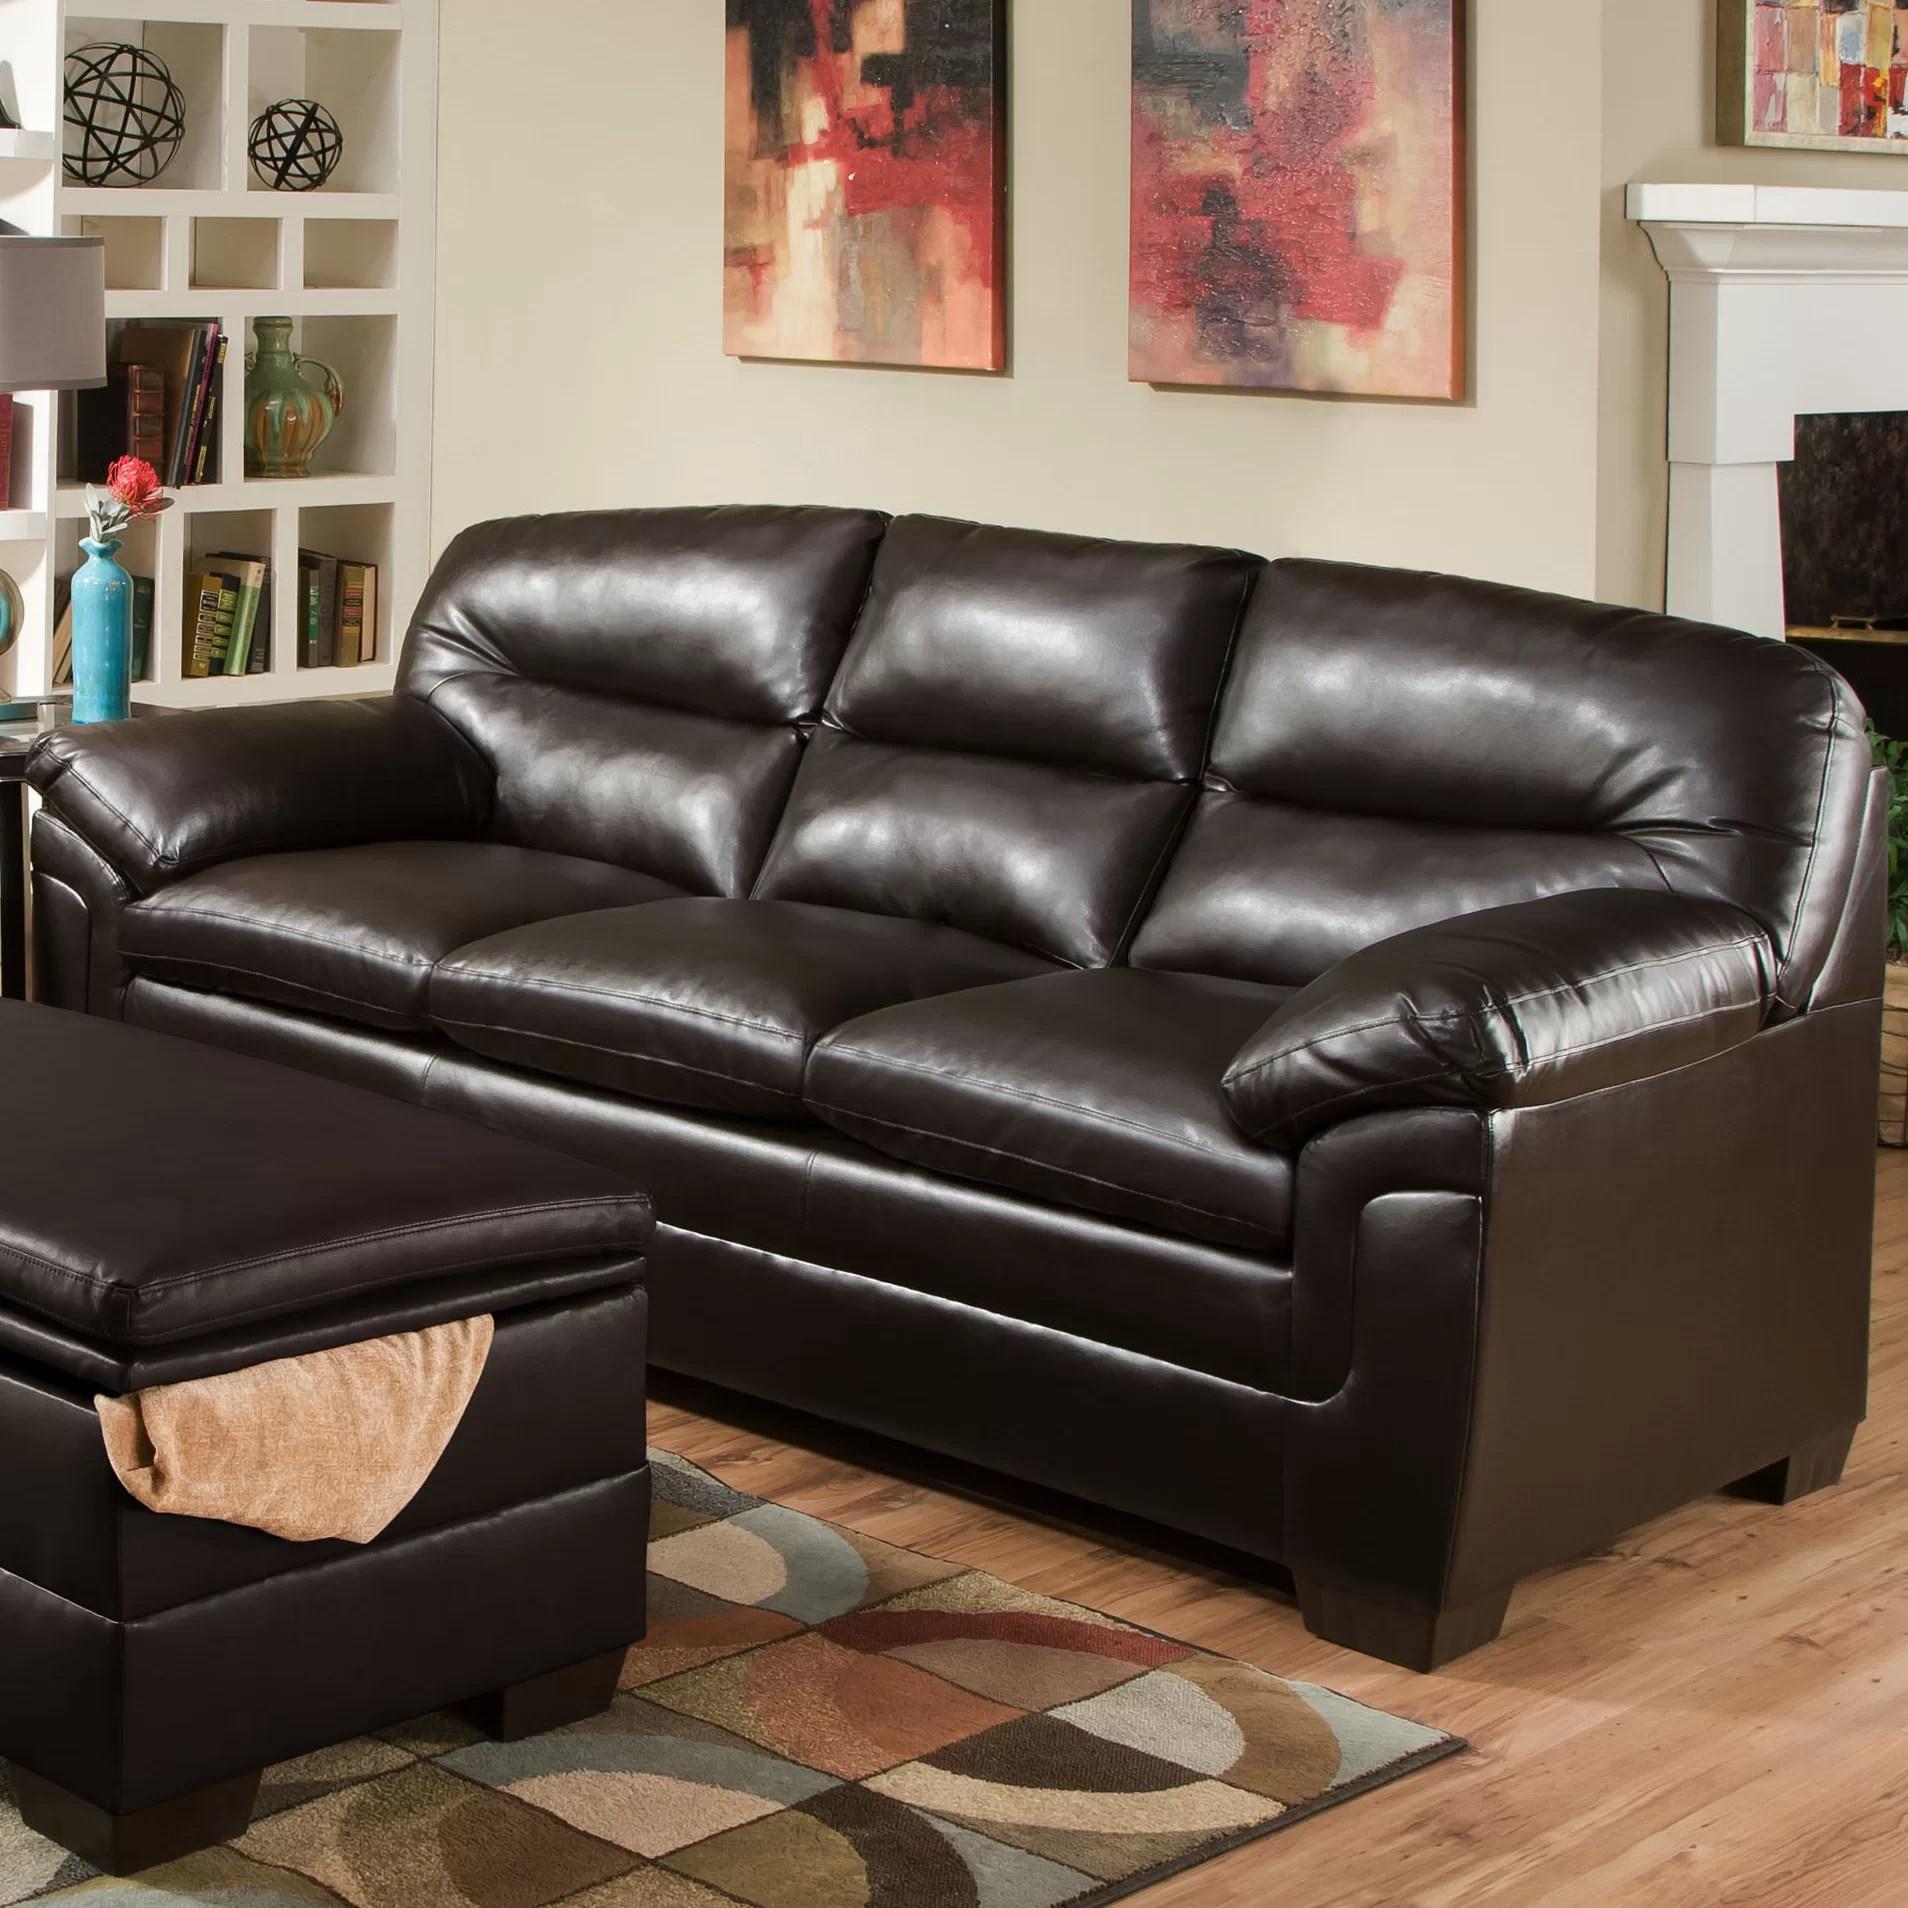 simmons manhattan sectional sofa reviews cheap beds upholstery and wayfair